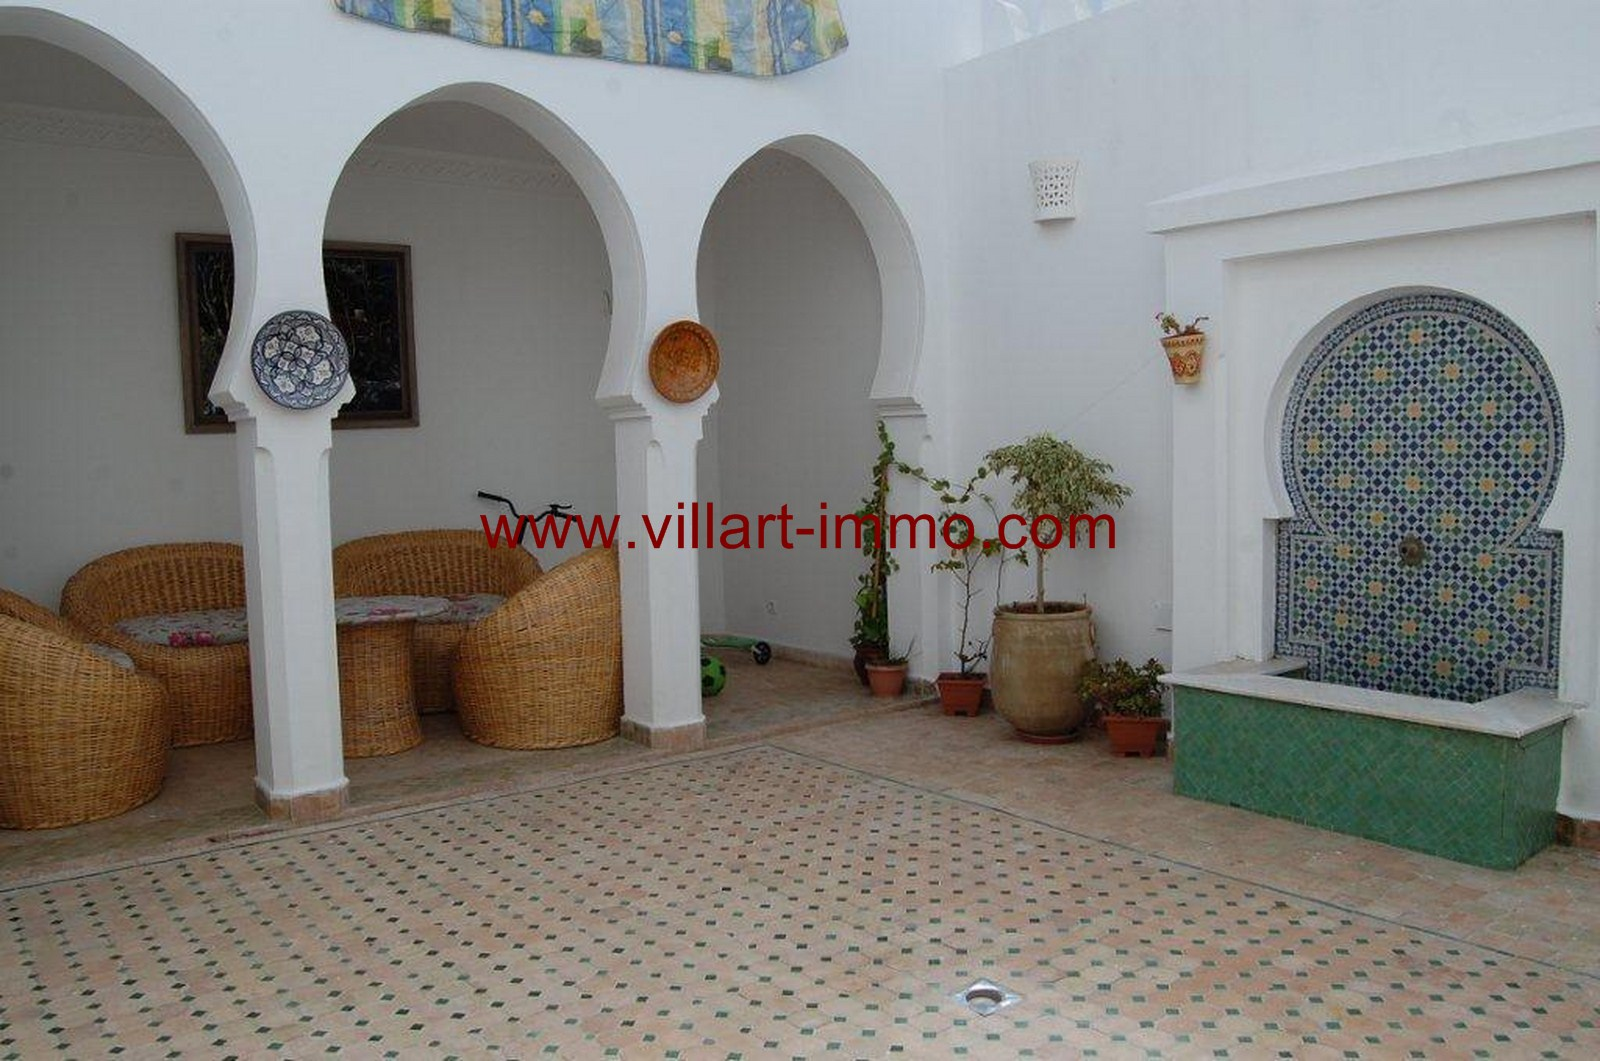 8-location-villa-meuble-malabata-tanger-terrasse-lv884-villart-immo